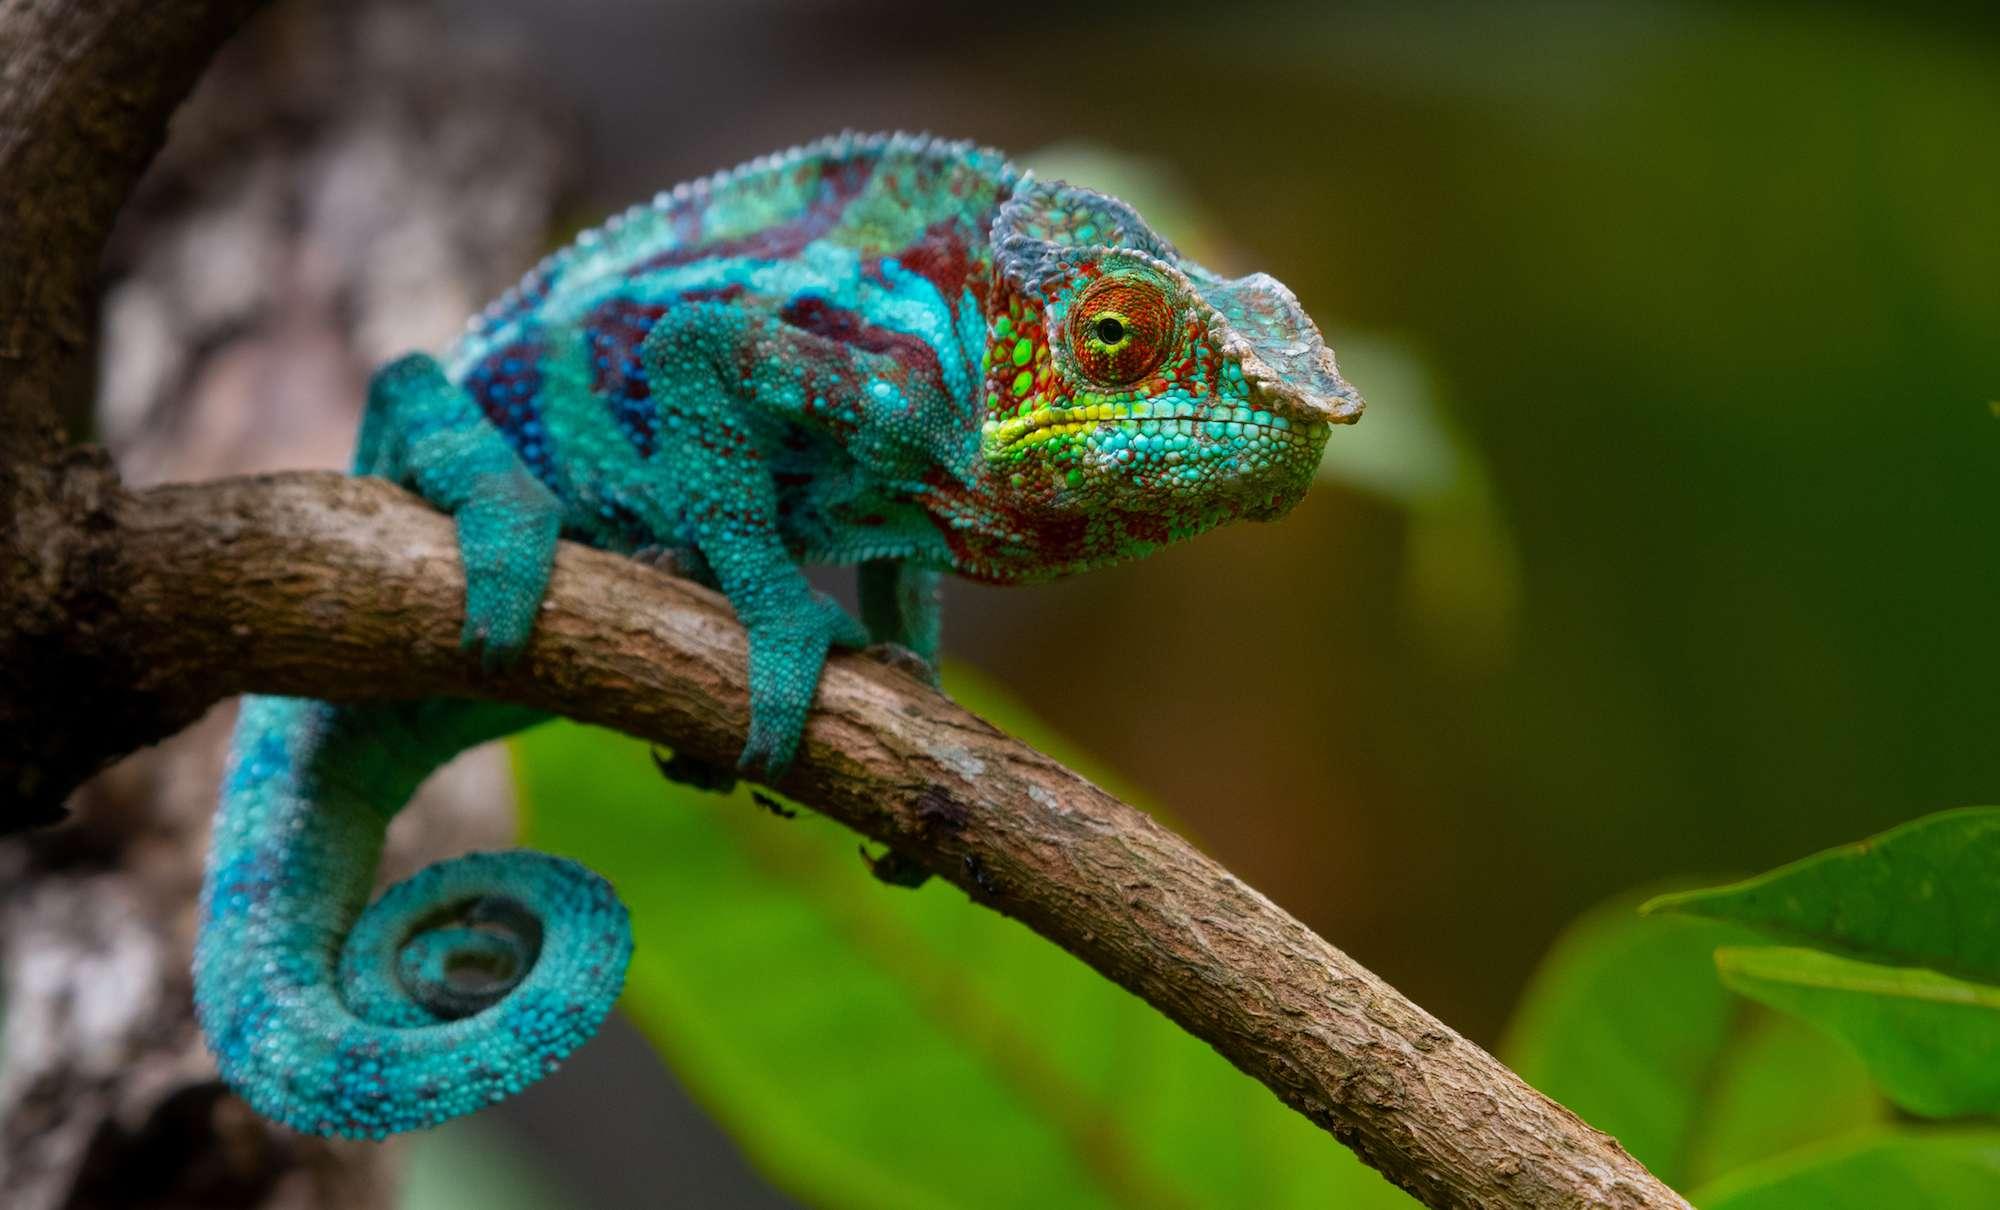 Chameleon changing turquoise